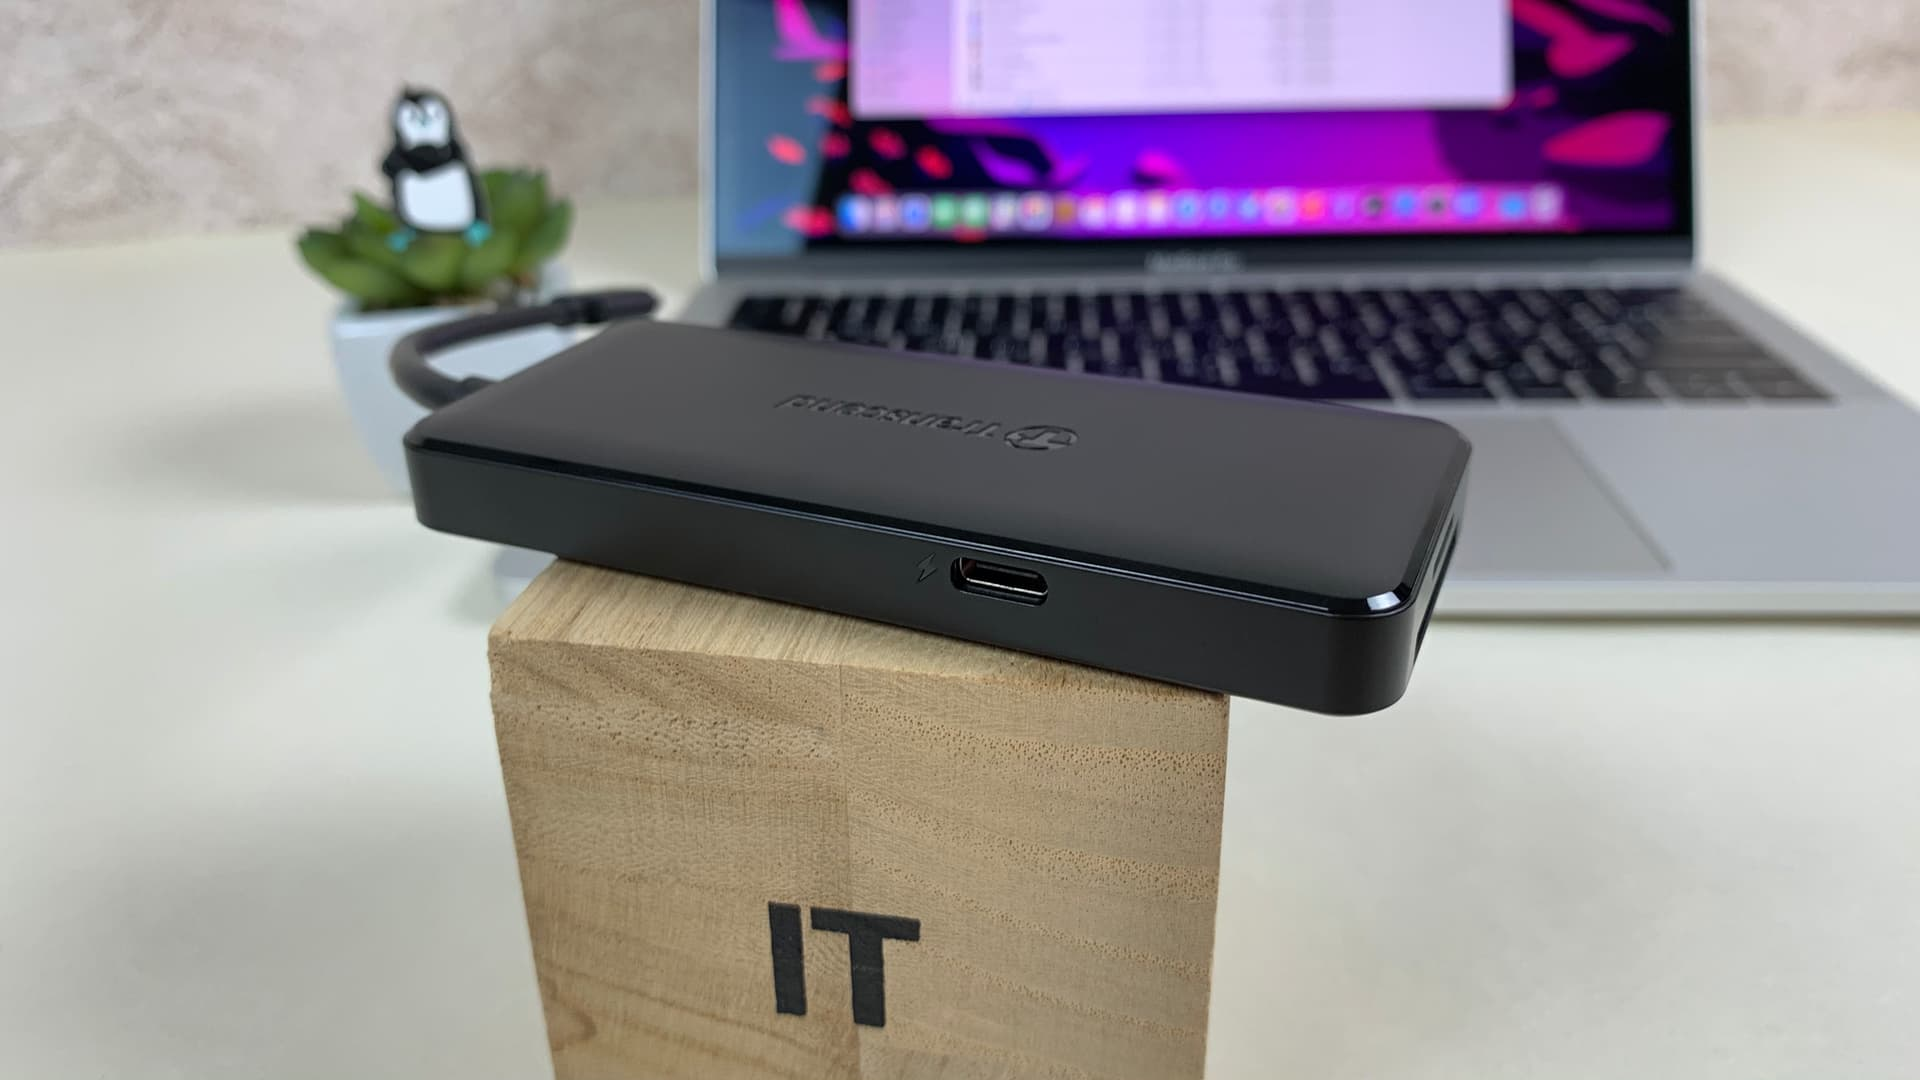 USB-хаб із USB Type-C (USB Power Delivery до 60 Вт)